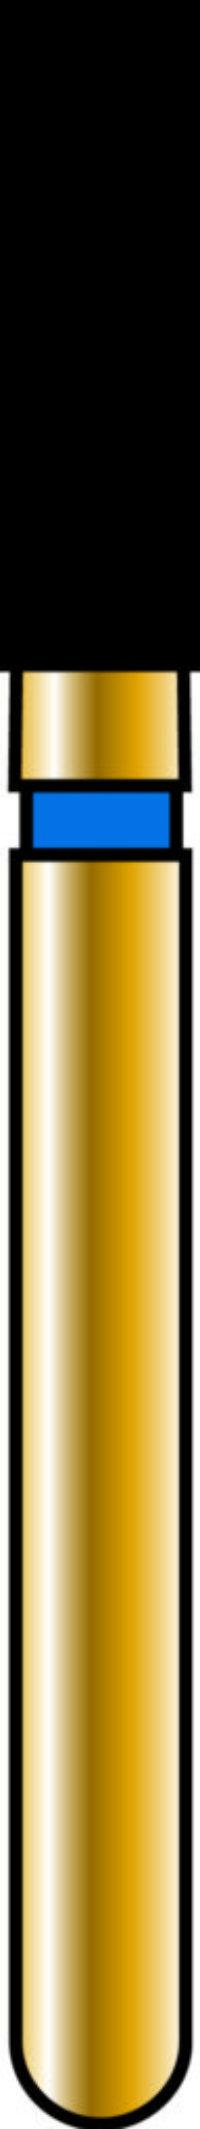 Flat End Cylinder 18-6mm Gold Diamond Bur - Coarse Grit